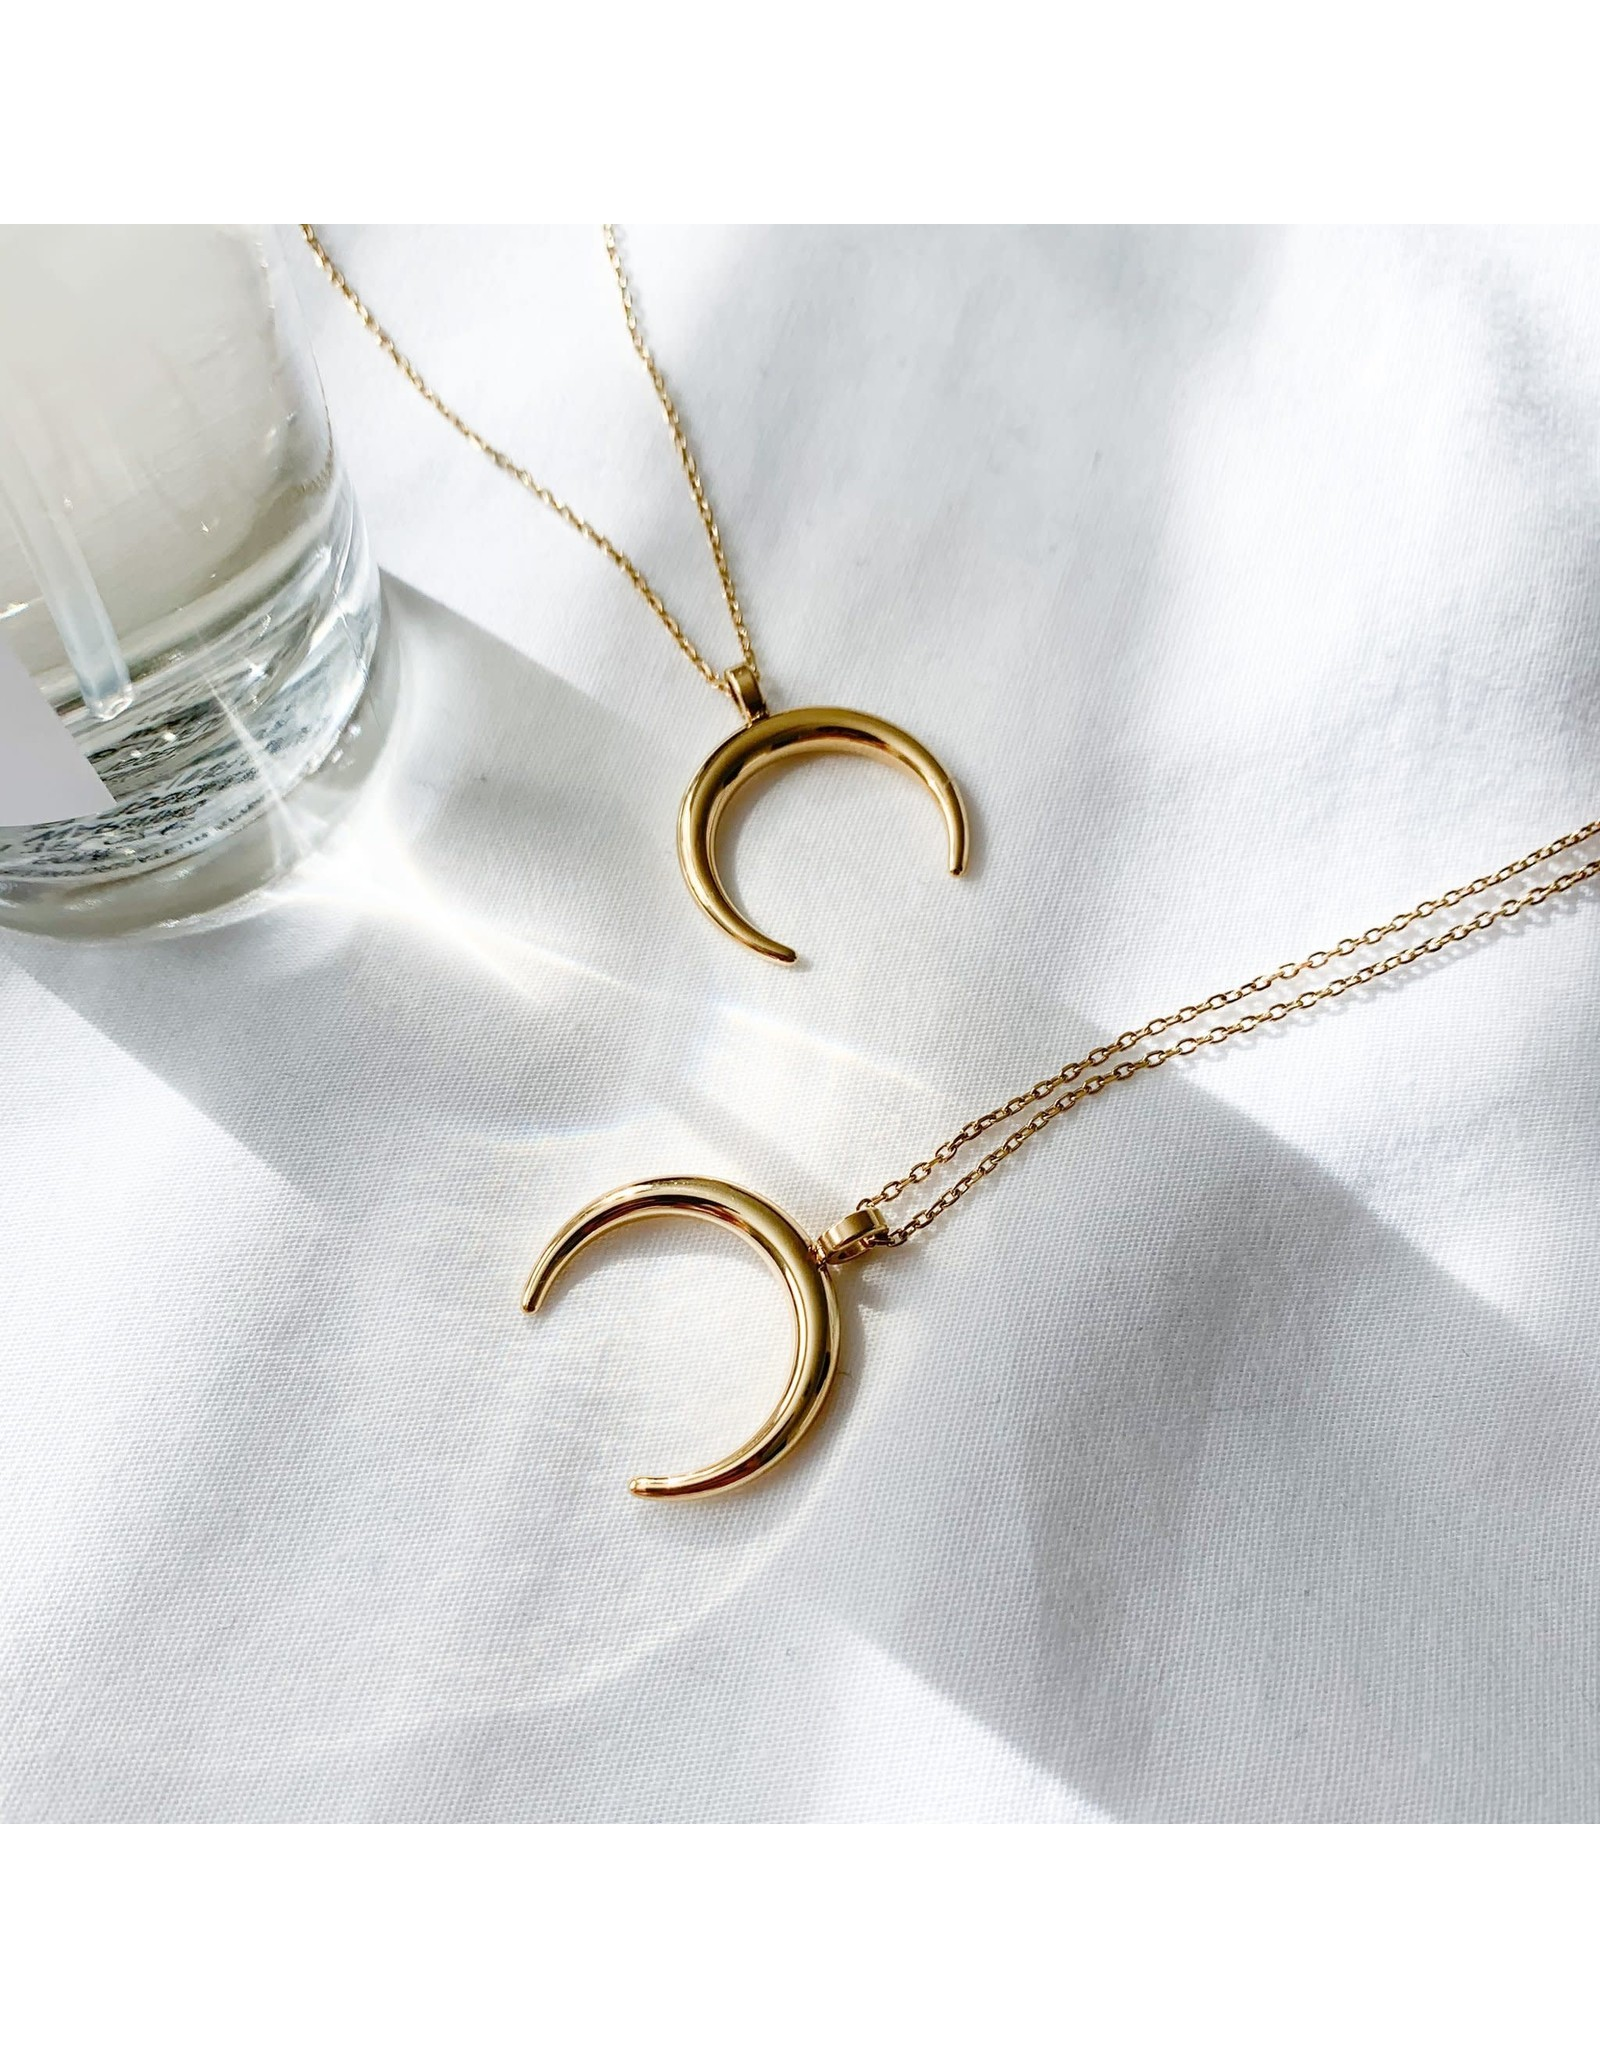 Gold Half Moon Necklace